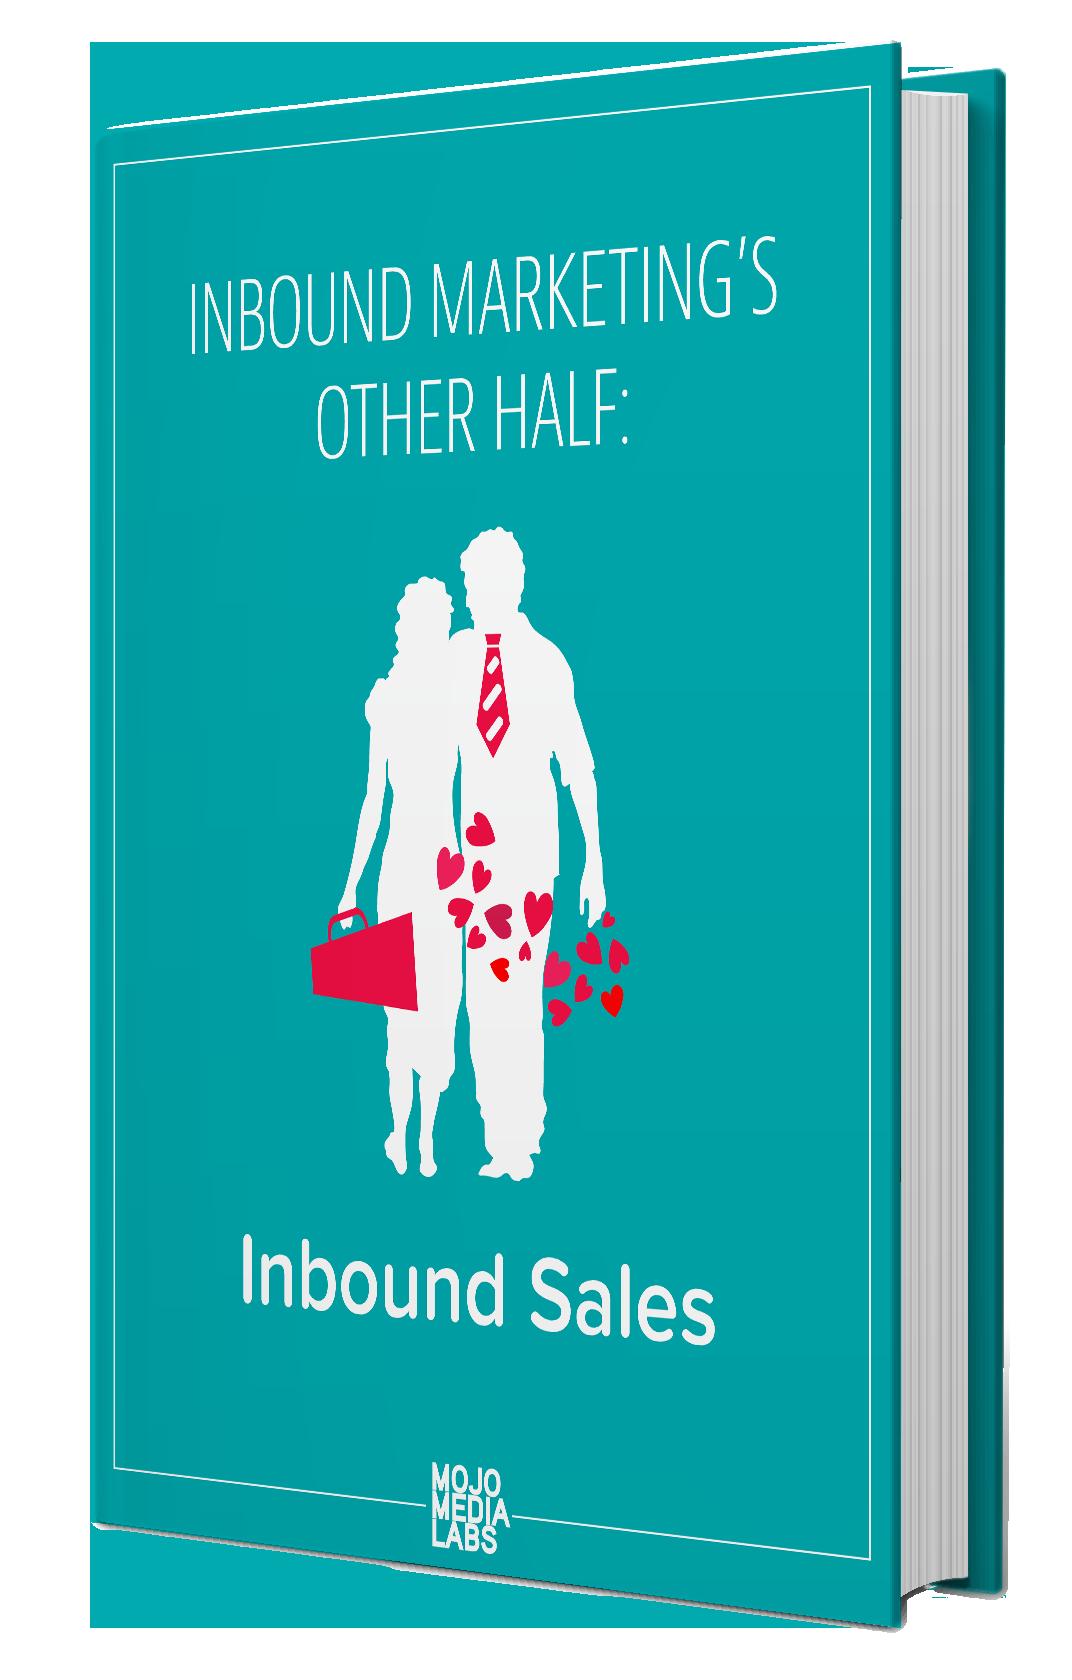 Mojo_Inbound Sales VDAY_TOFU_LP image.png